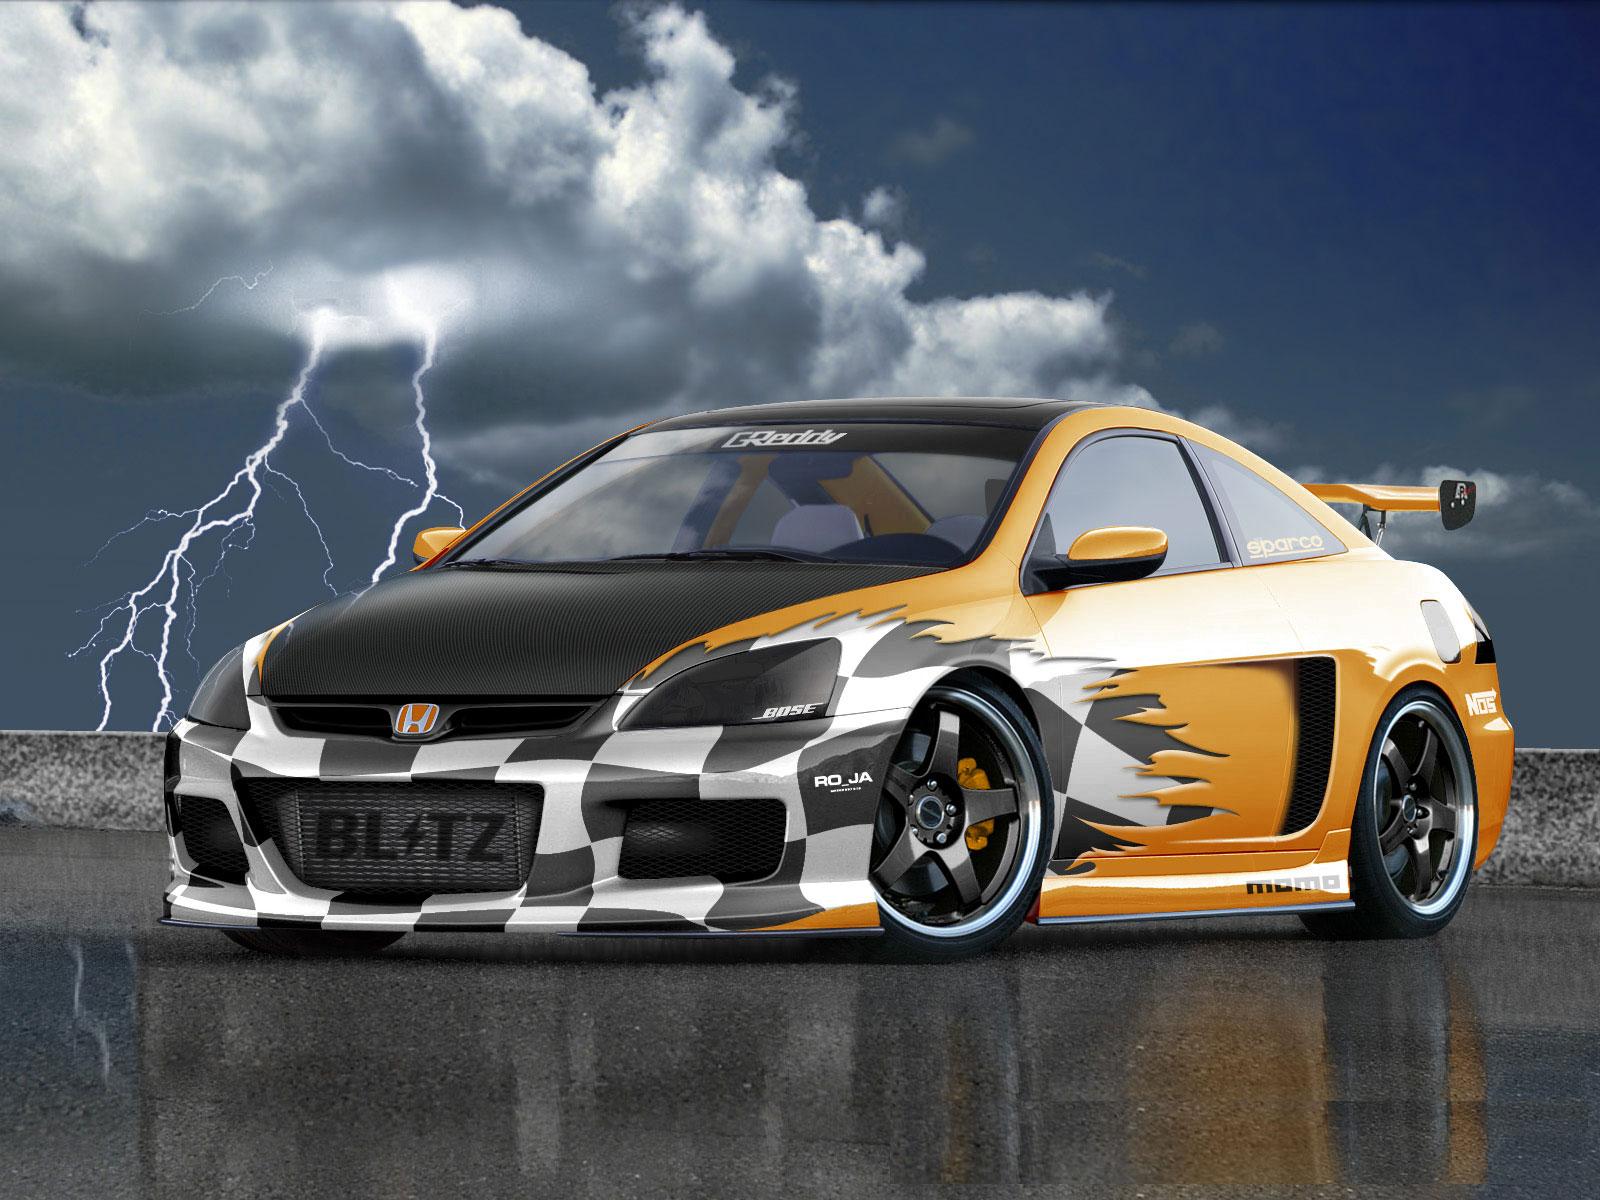 car-desktop-backgrounds.jpg